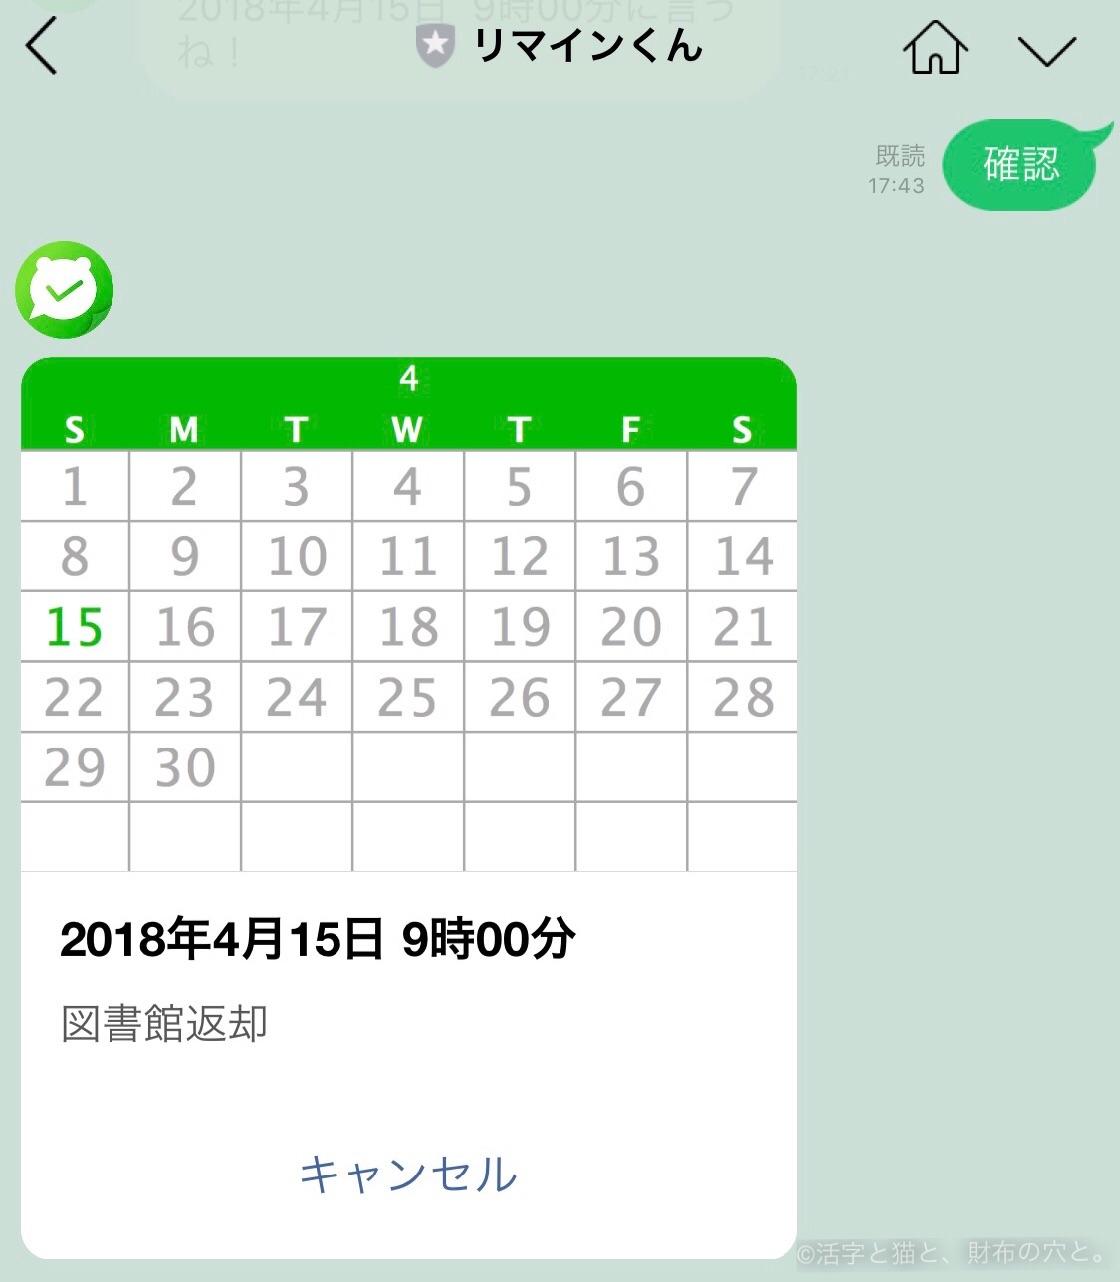 f:id:borboleta:20180402175854j:image